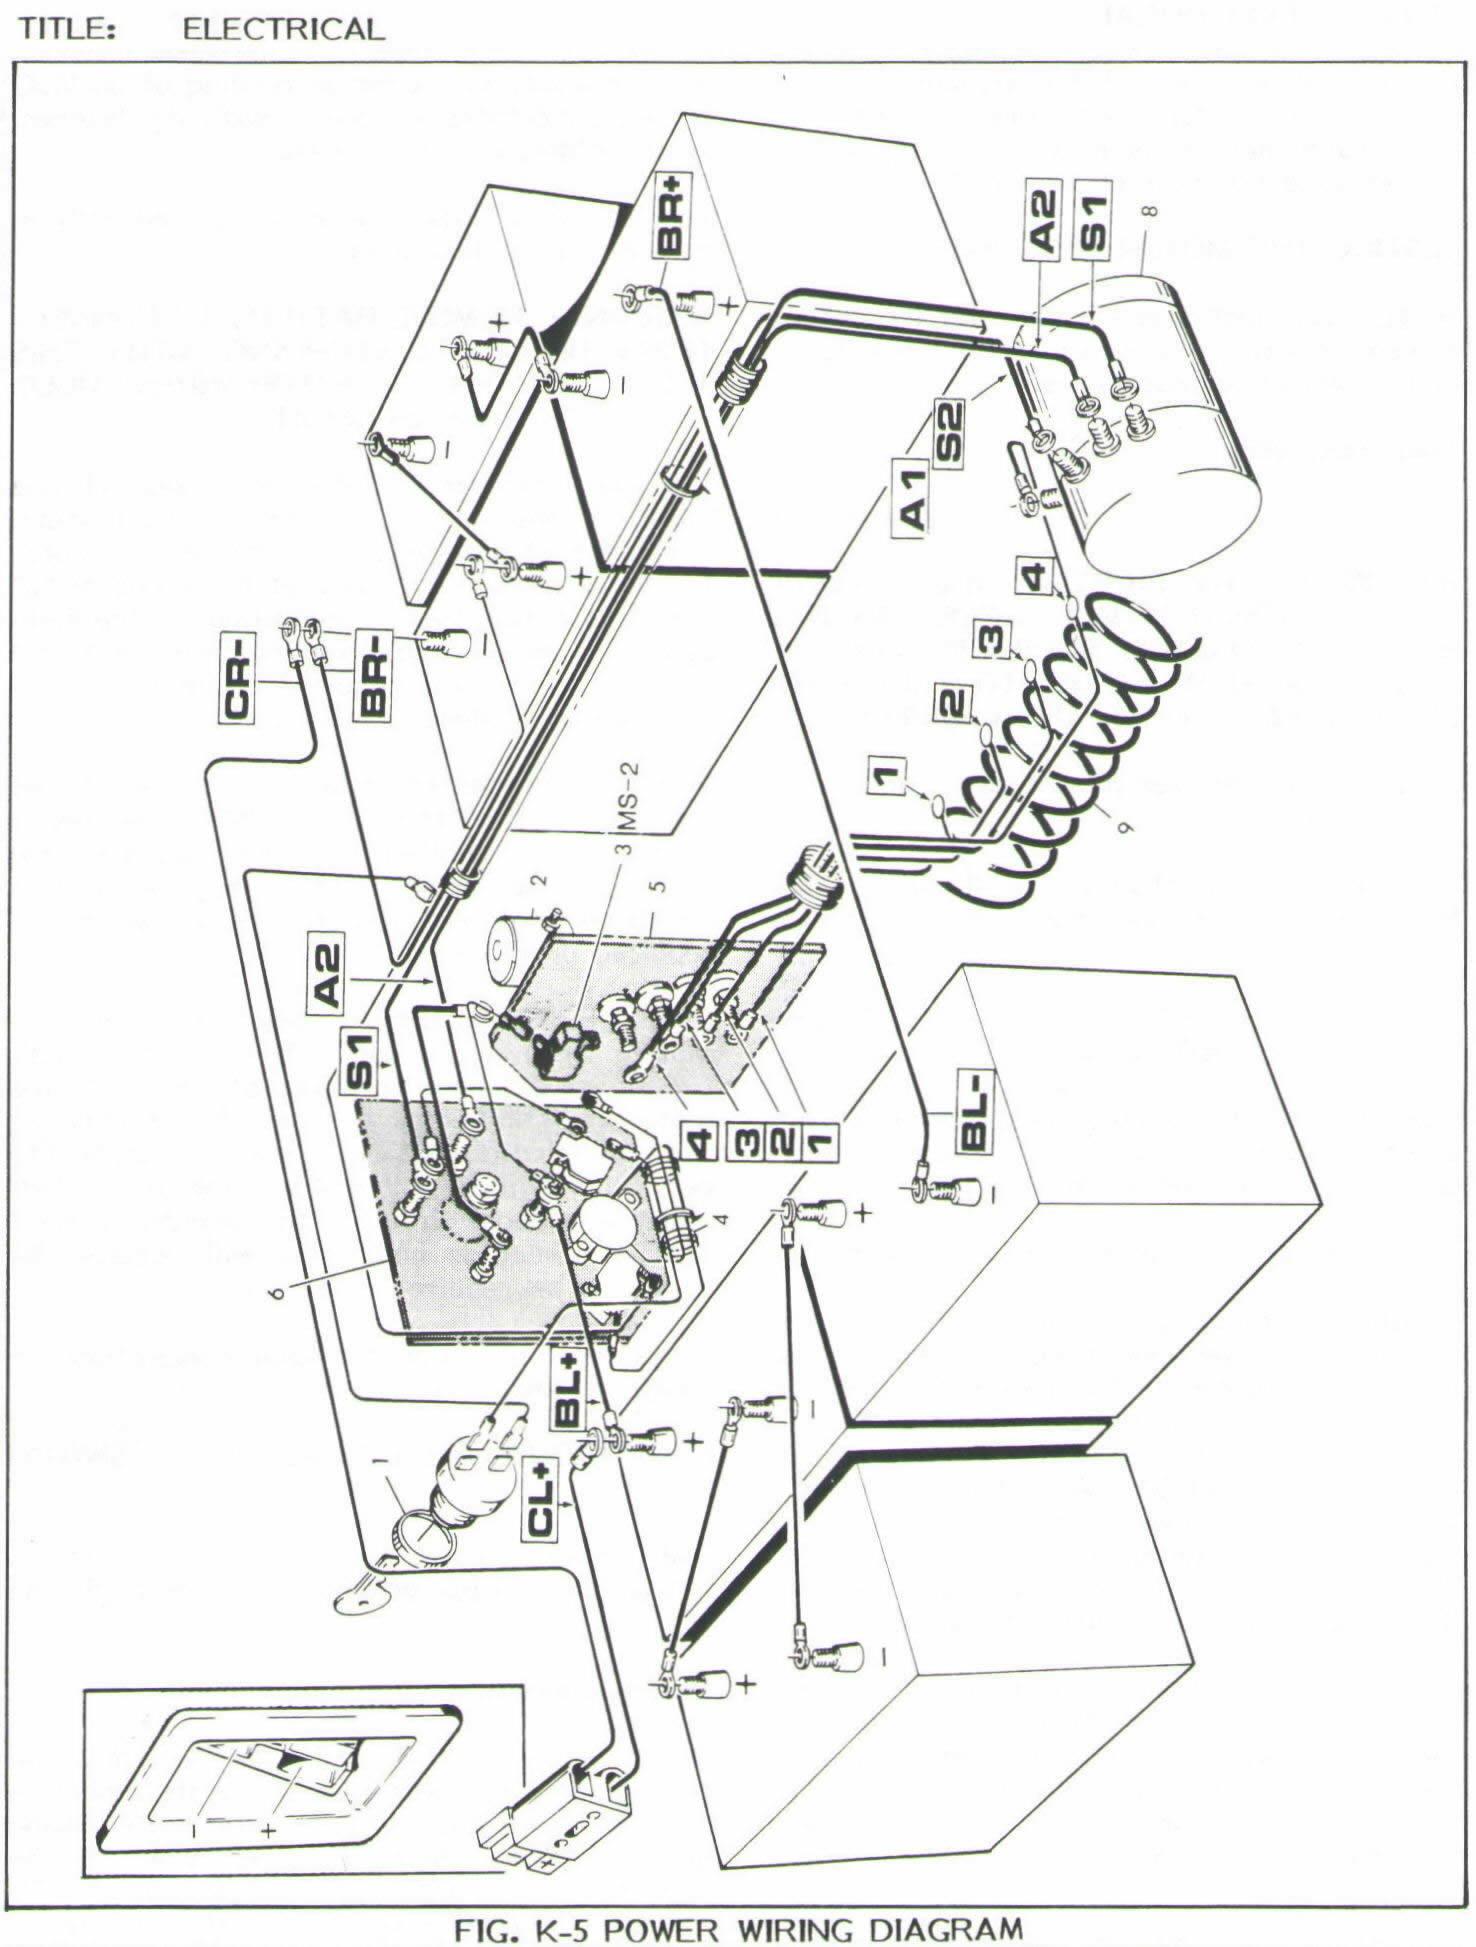 1983 Ez Go Gas Golf Cart Wiring Diagram - 2001 Dodge Durango Fuse Diagram -  bobcate-s70.losdol2.jeanjaures37.fr